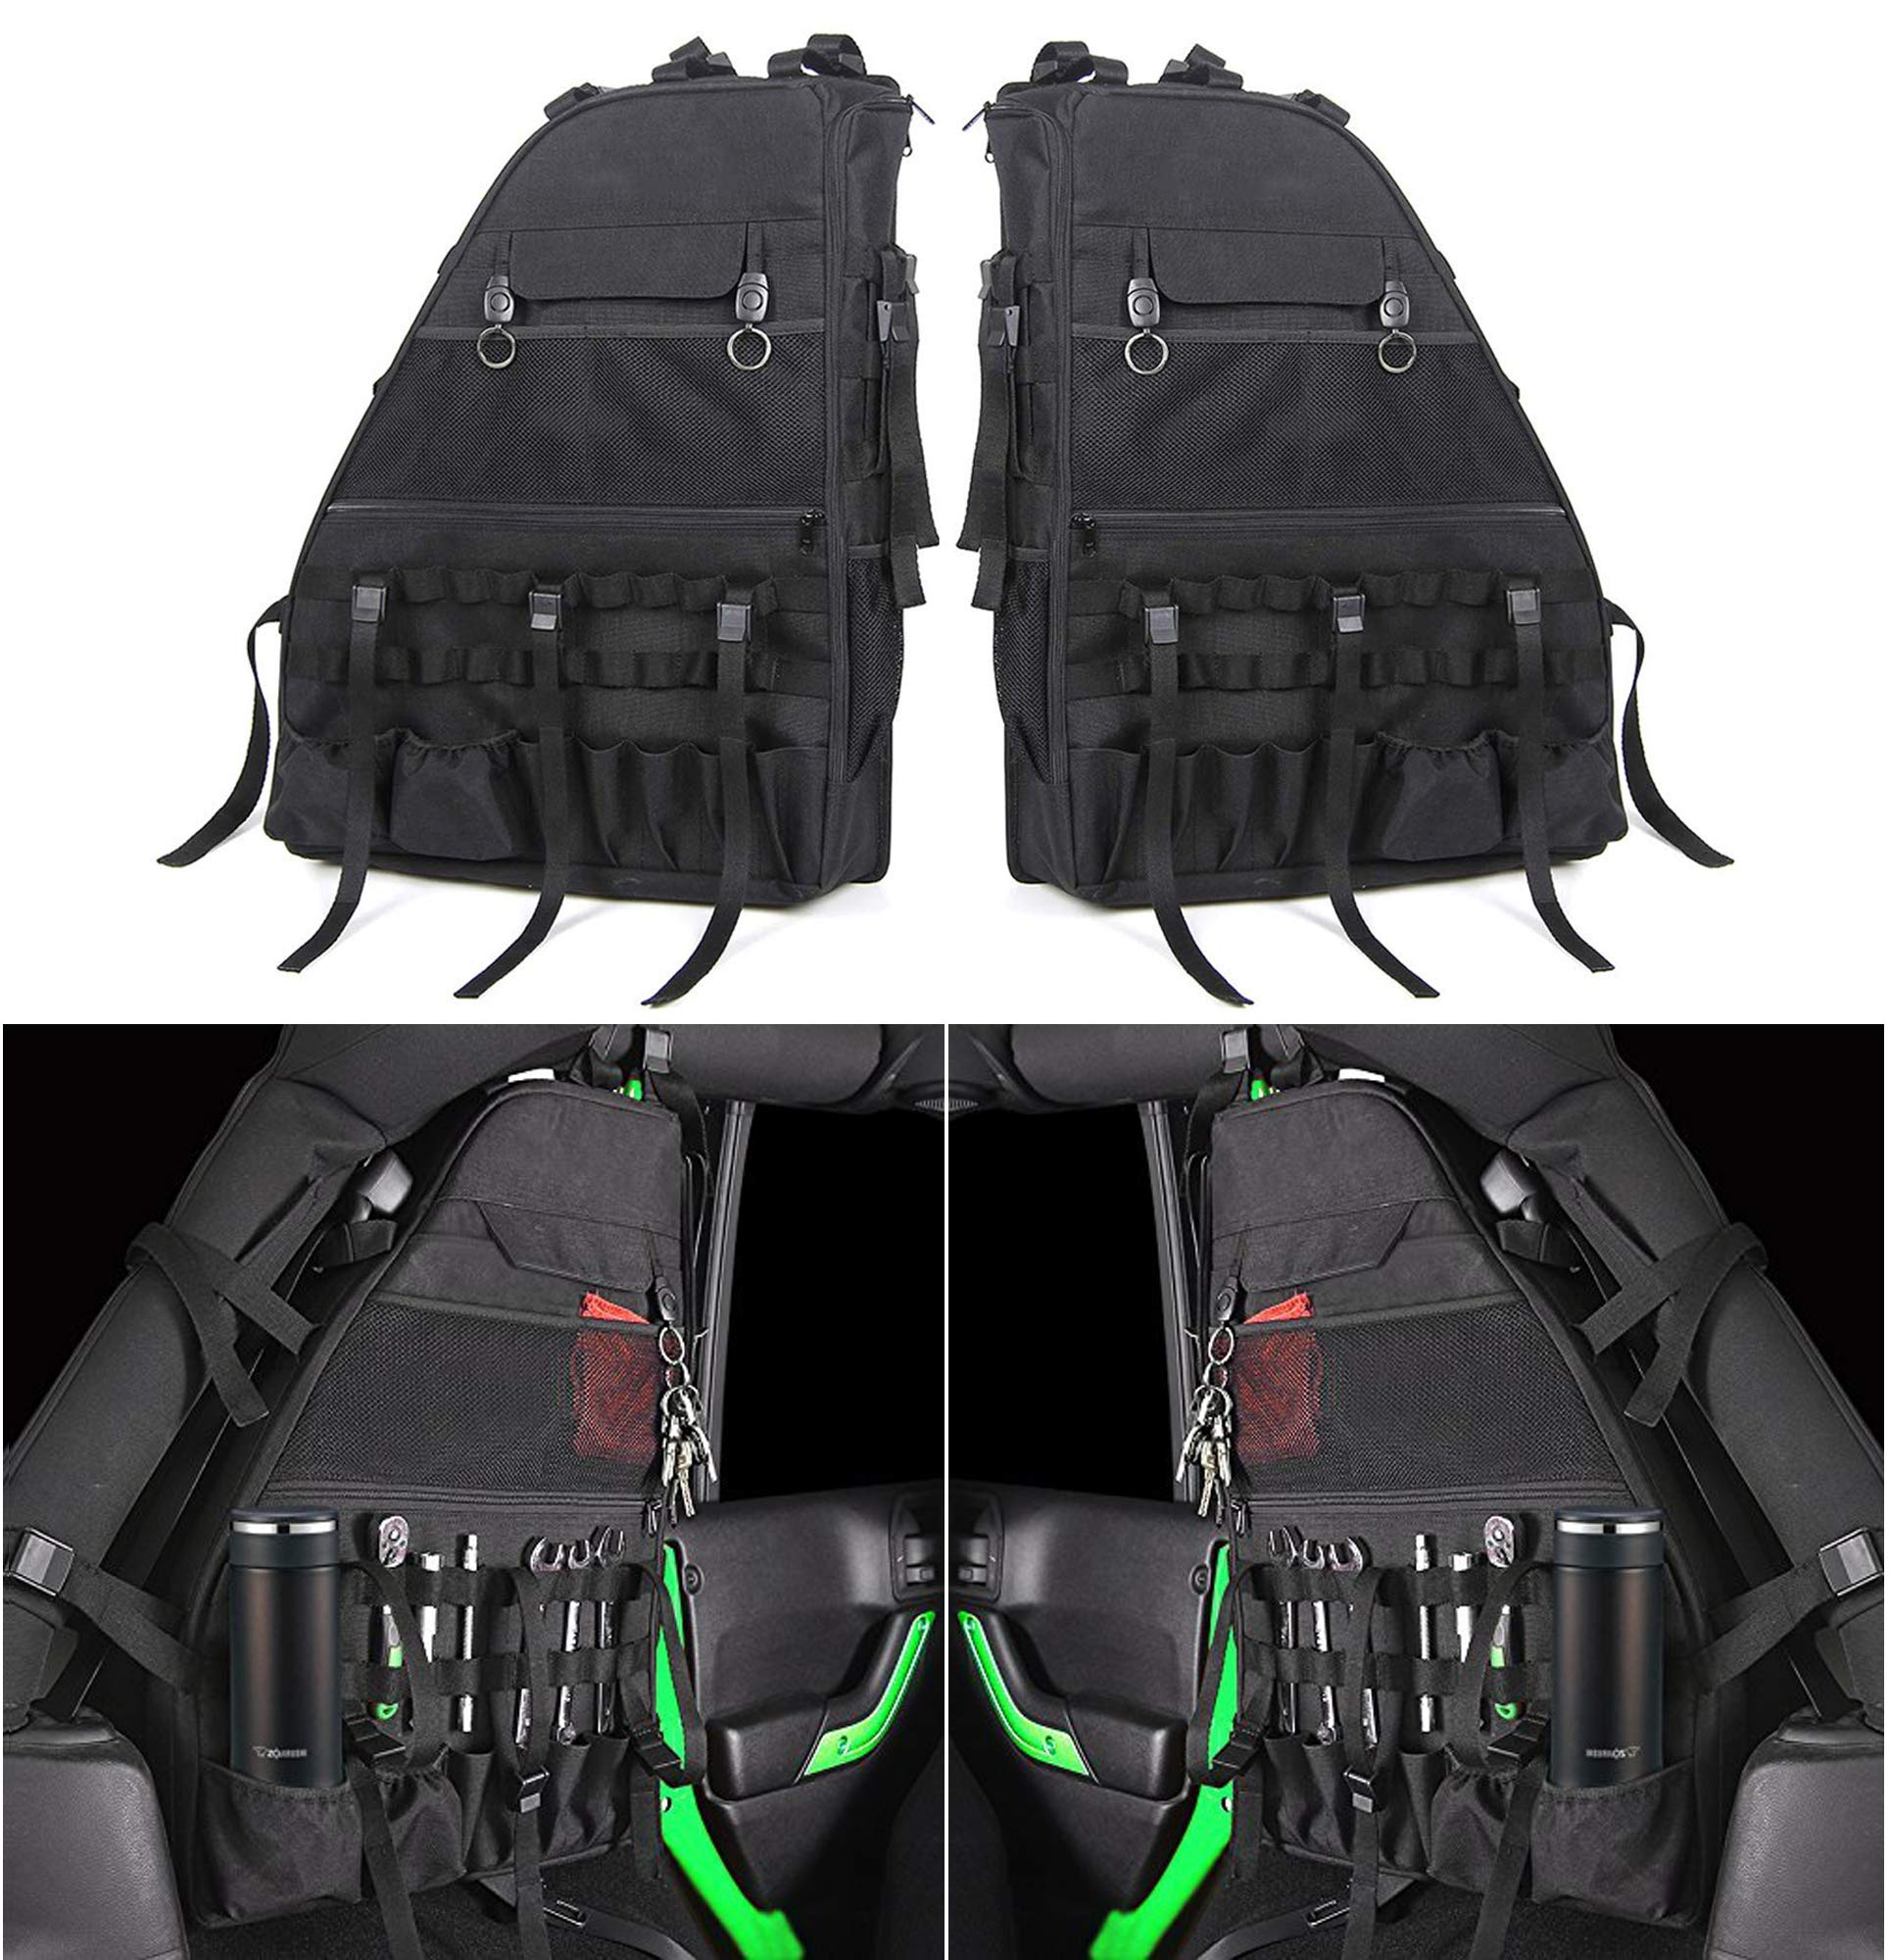 Roll Bar Storage Bag Cage with Multi-Pockets Compatible for Jeep Wrangler JK JKU TJ Unlimited 4 Doors - Pack of 2